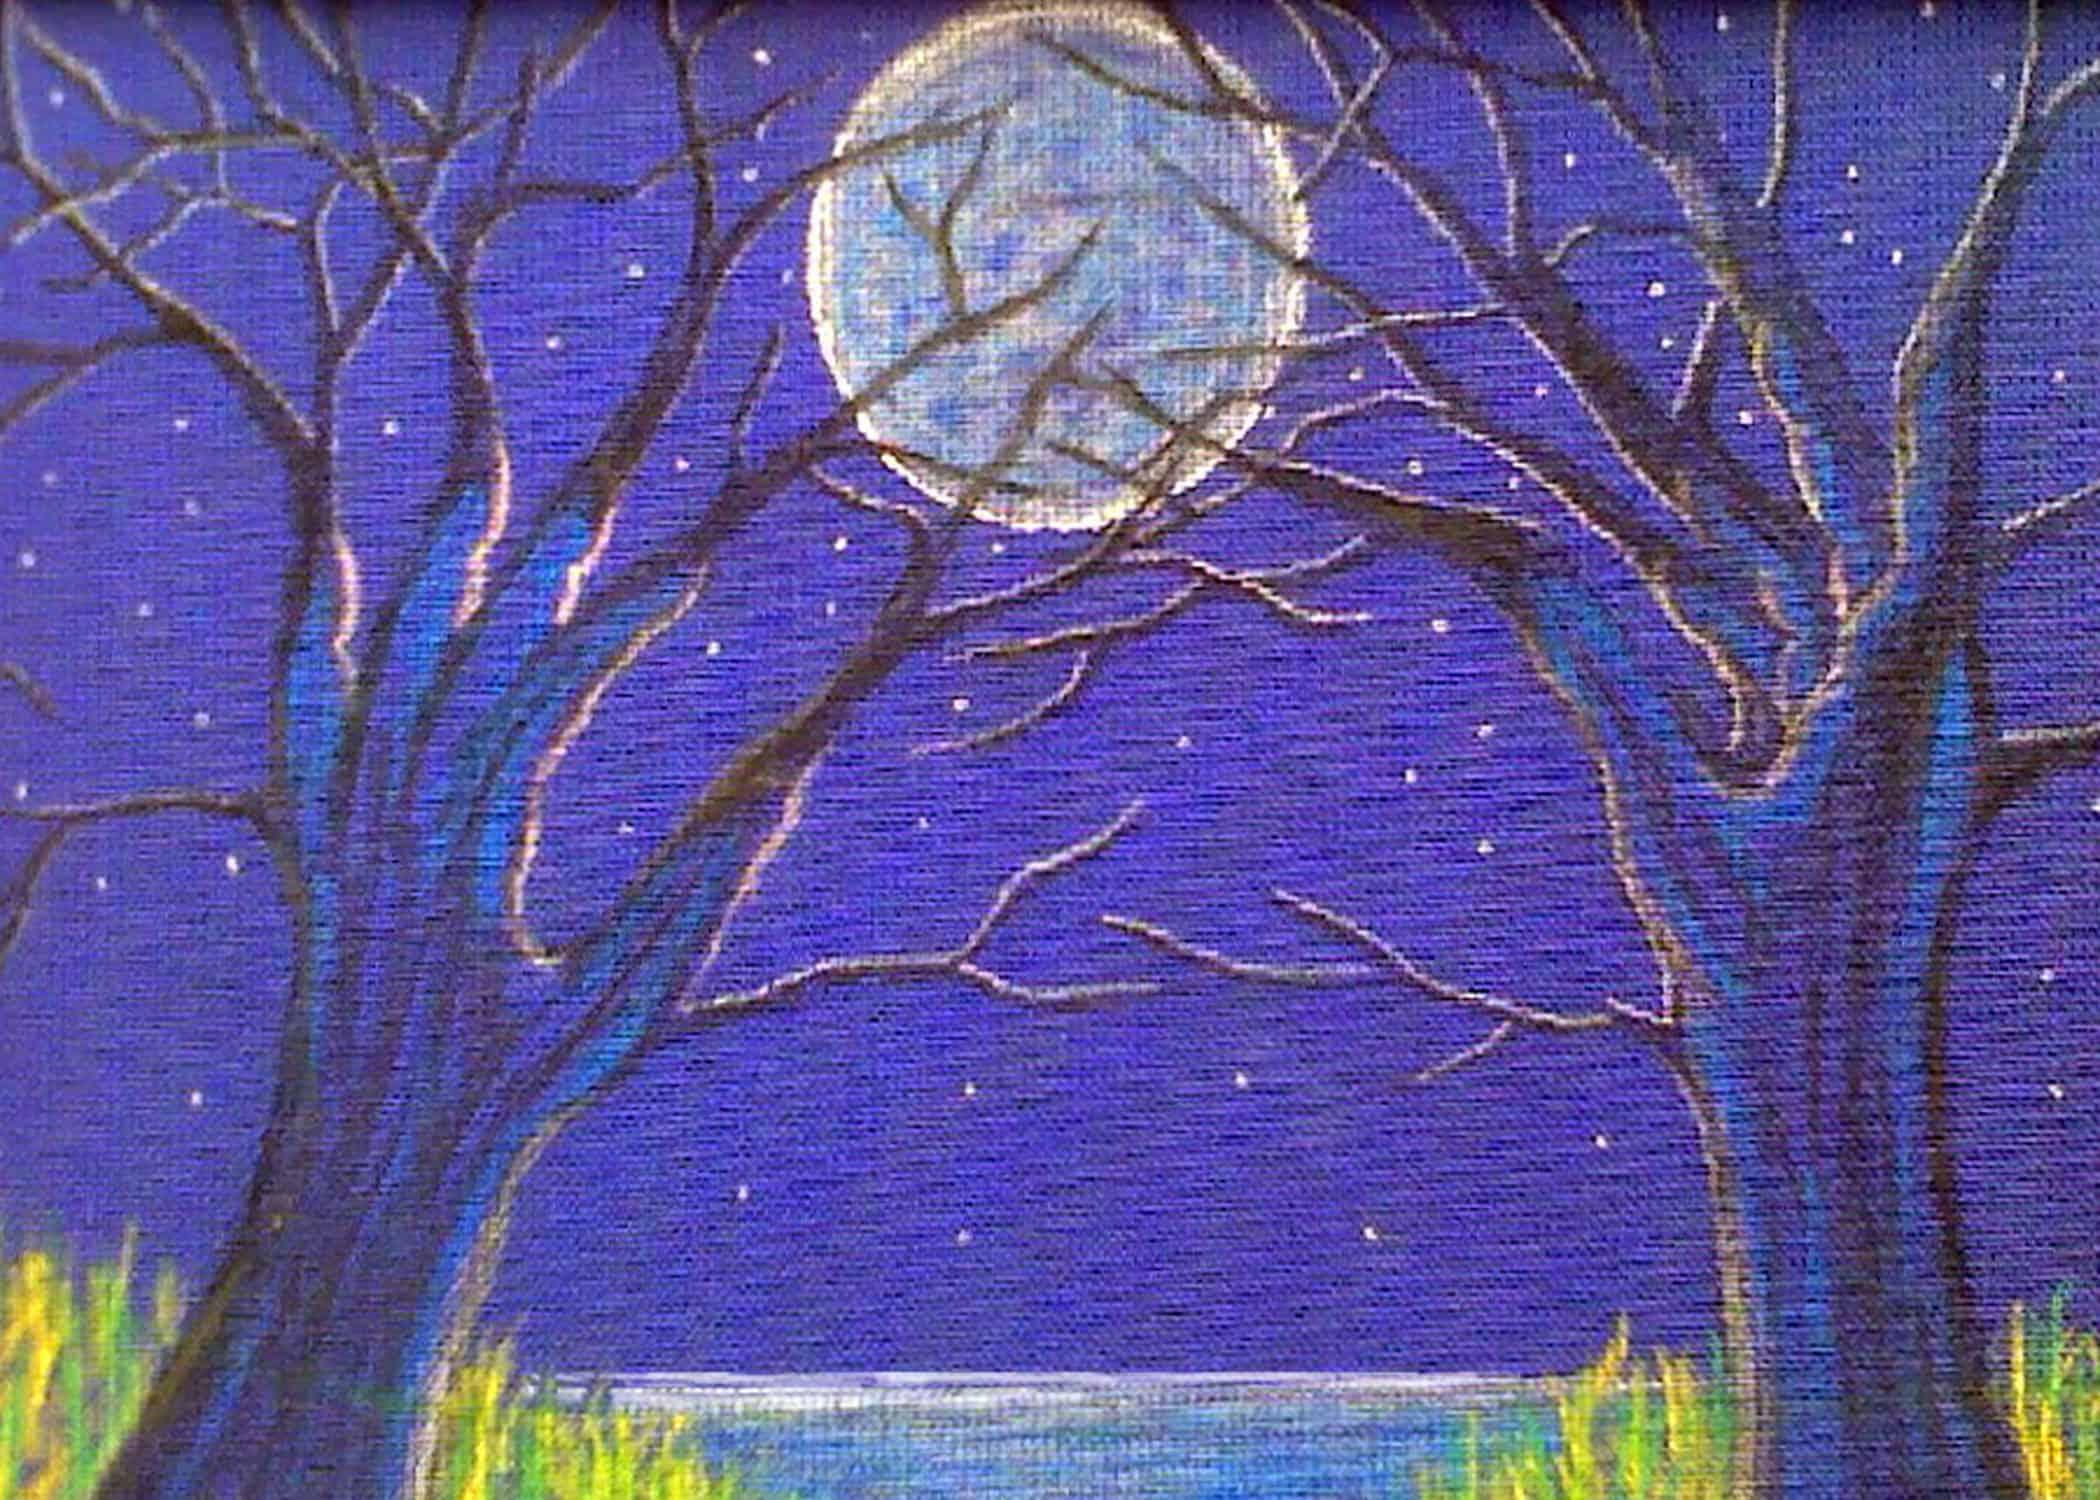 Winter tree hands reach for full moon